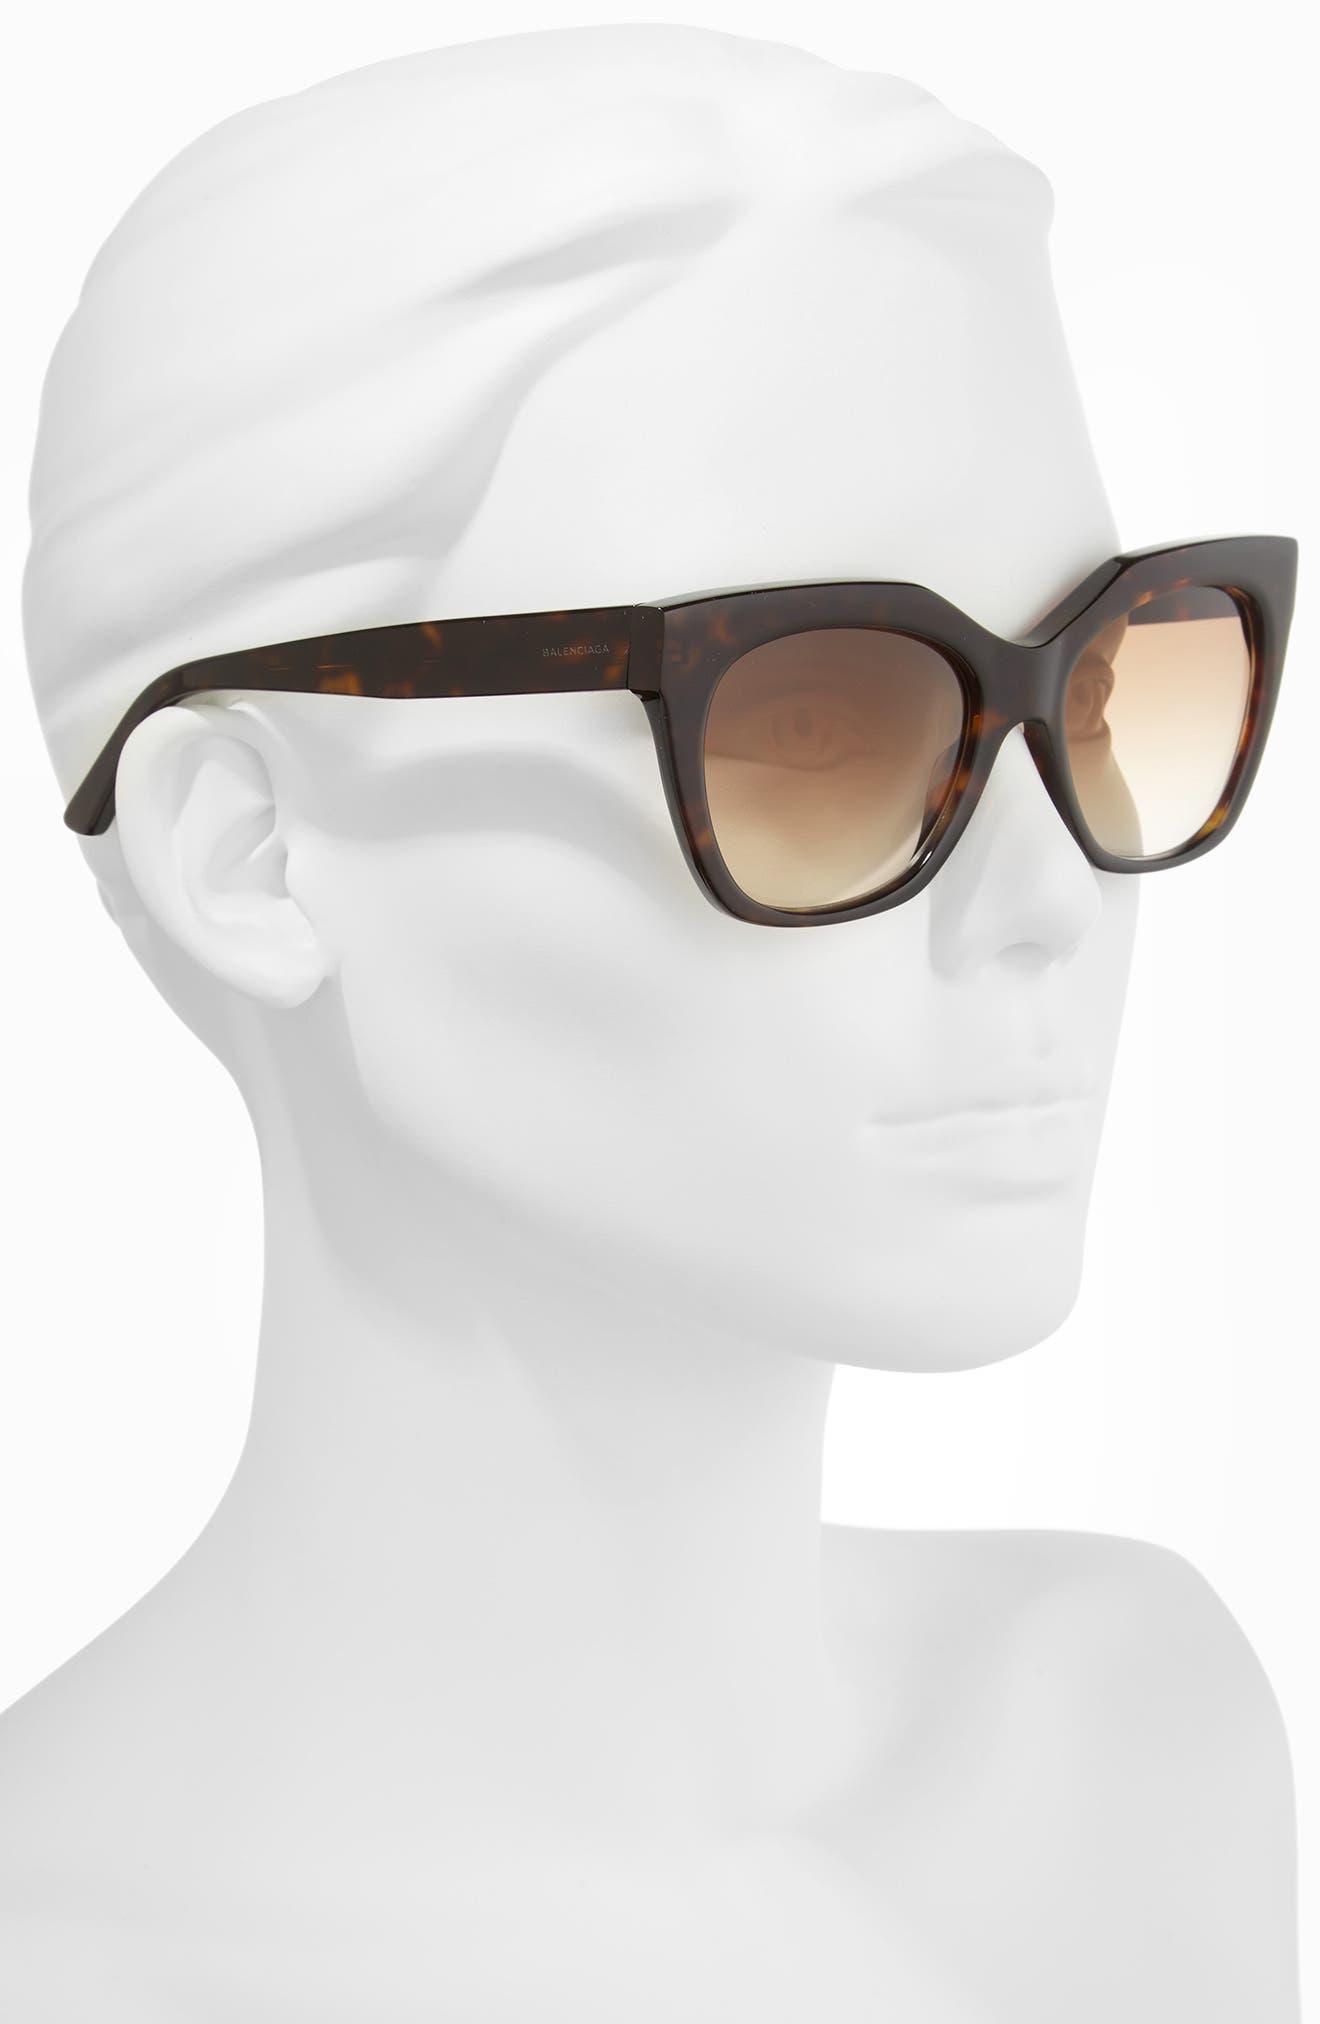 54mm Cat Eye Sunglasses,                             Alternate thumbnail 2, color,                             DARK HAVANA/ GRADIENT BROWN